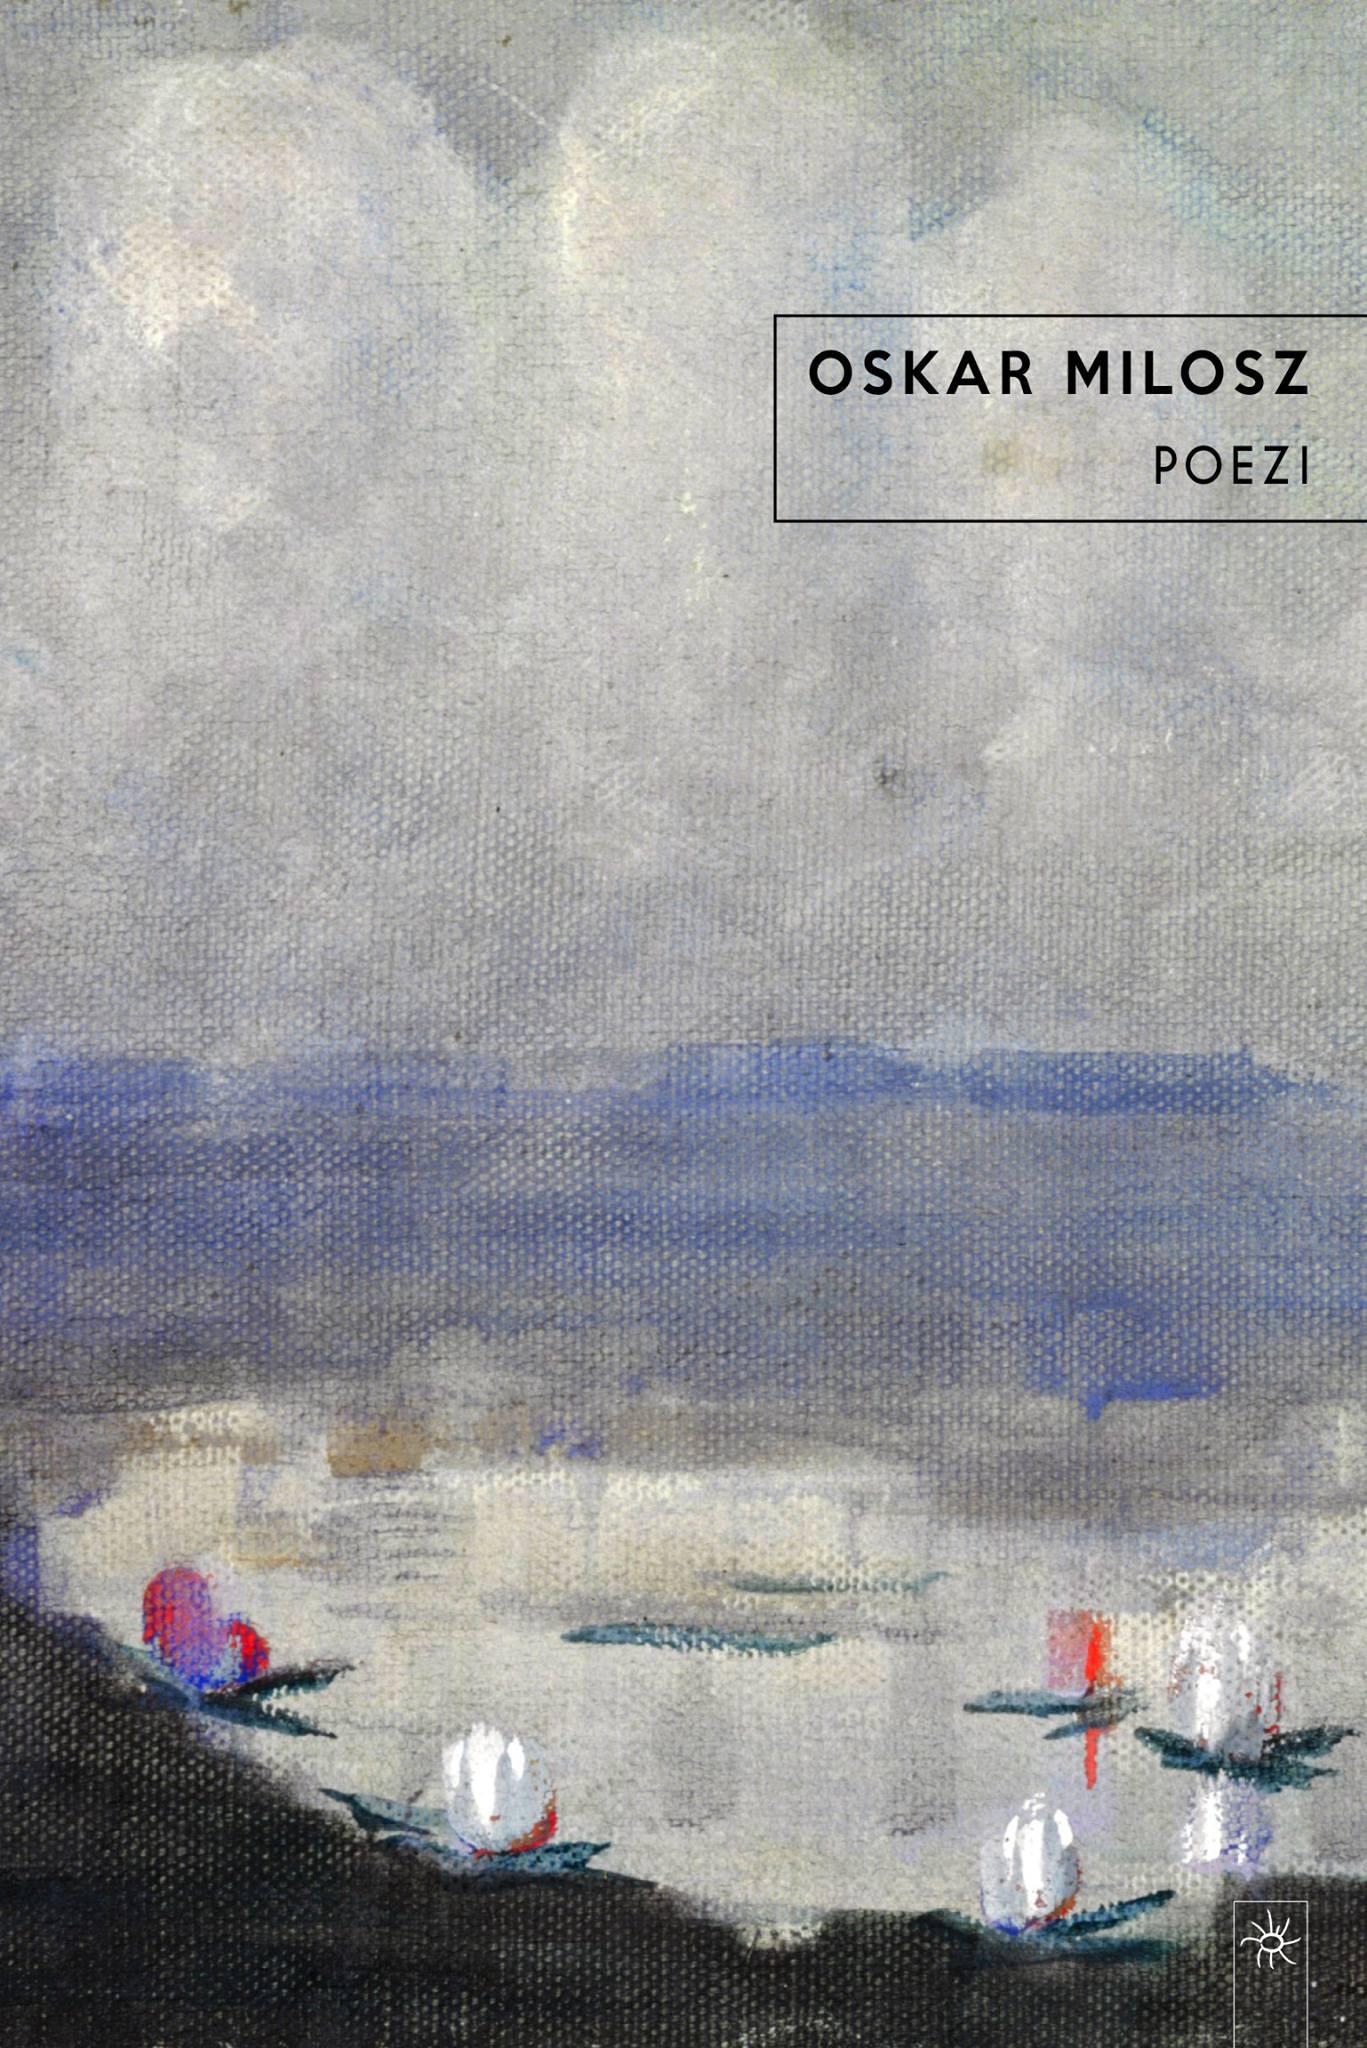 Poezi Oskar Milosz